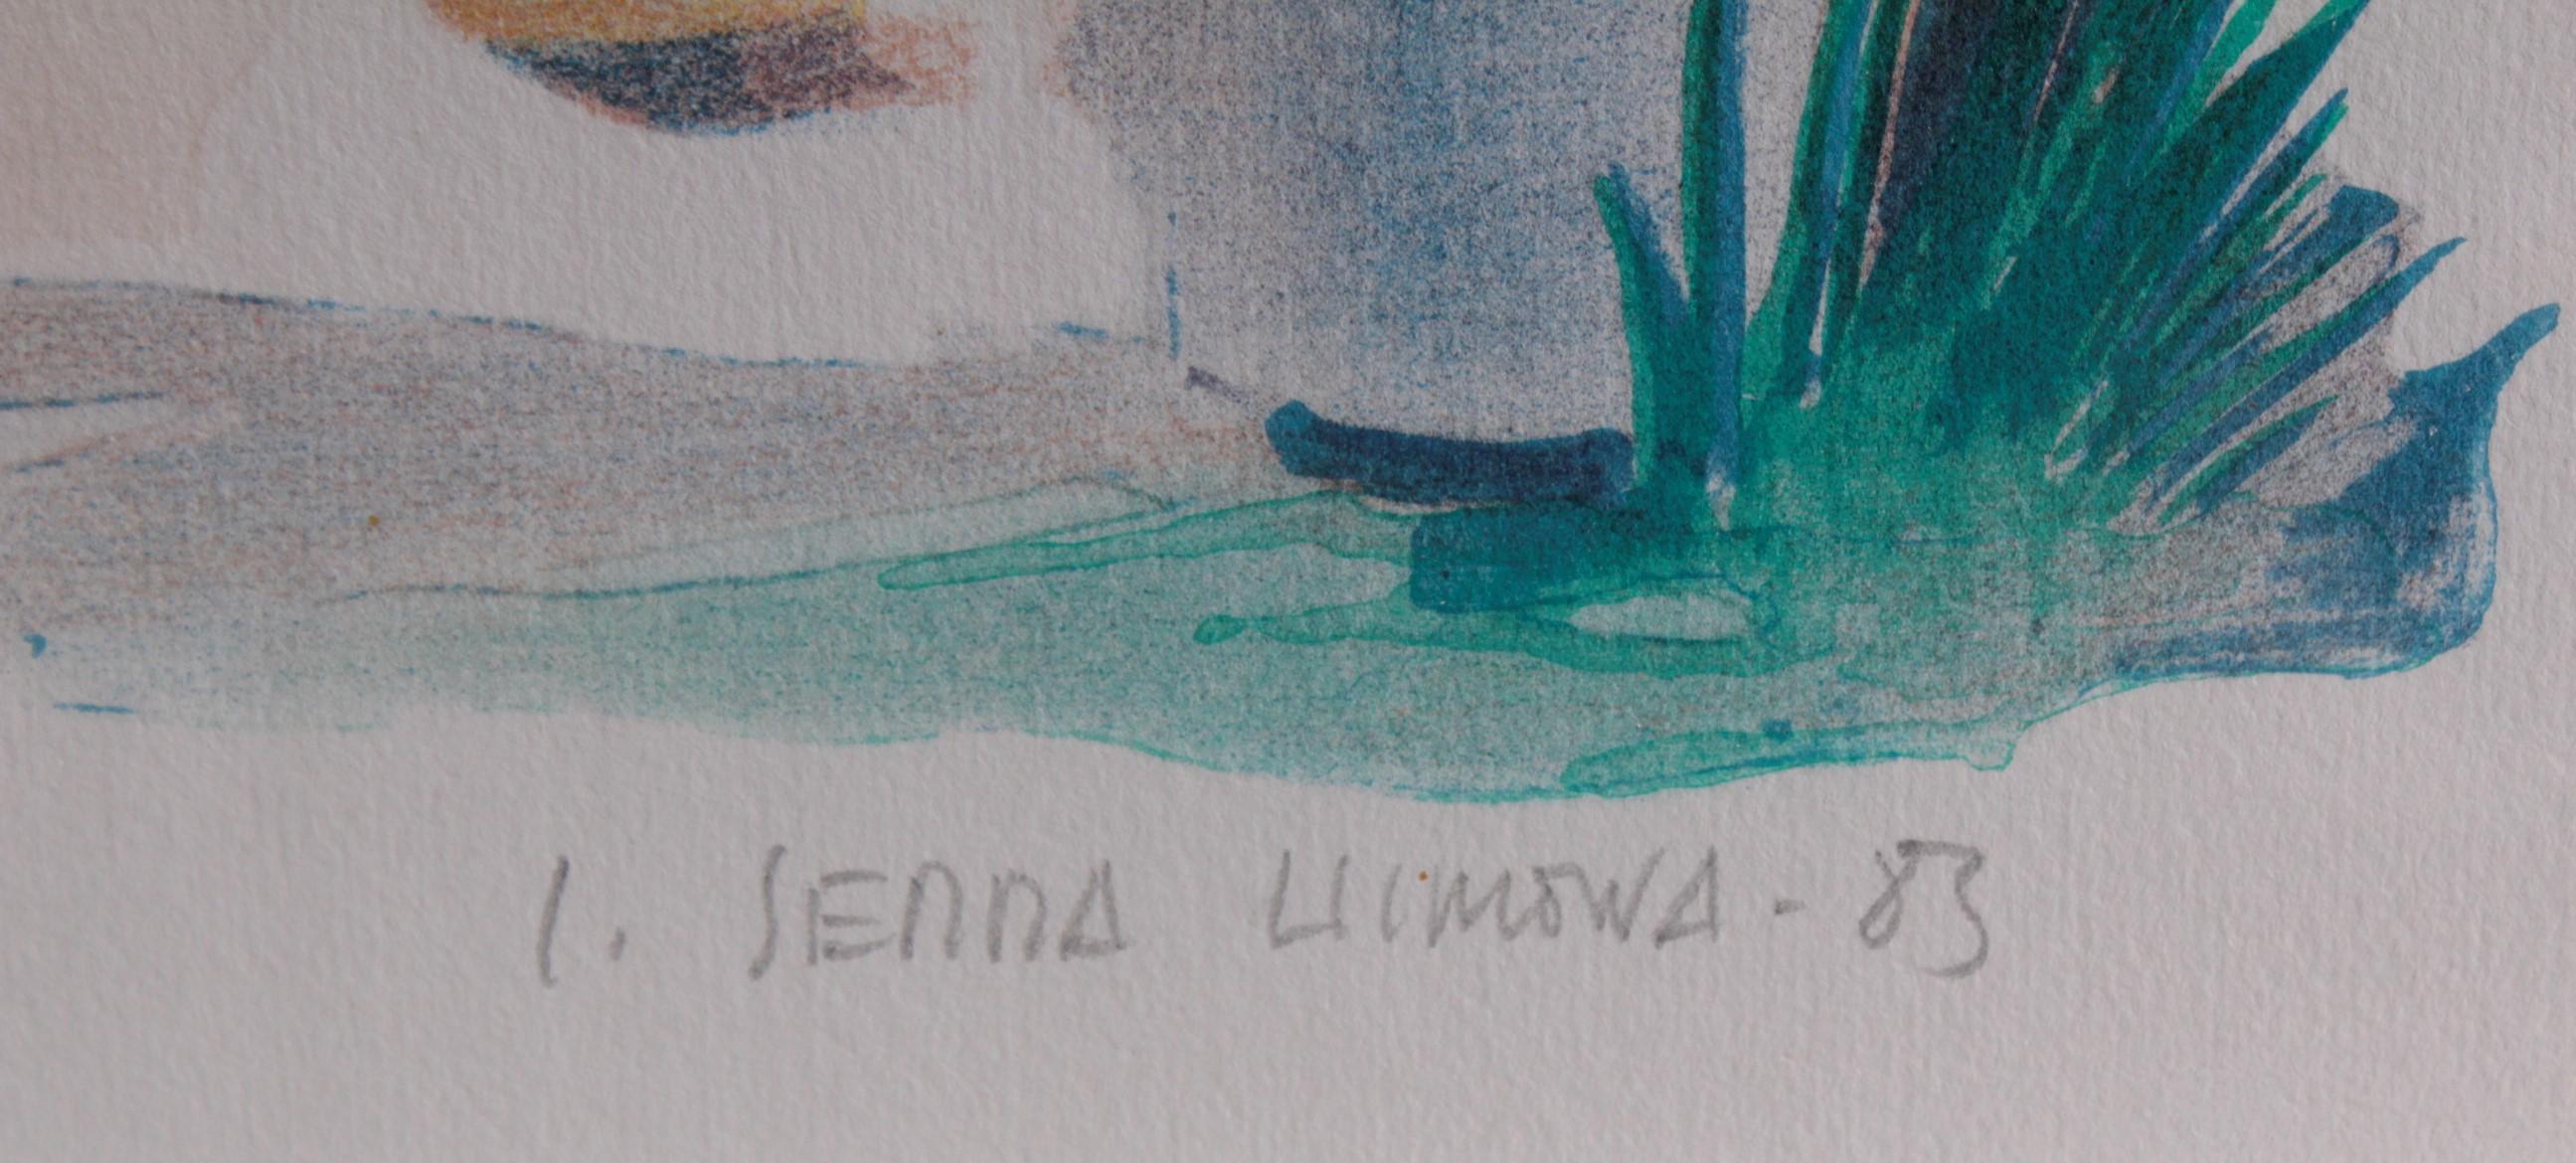 Josep Serra Llimona (1937). Schattenplätzchen-3